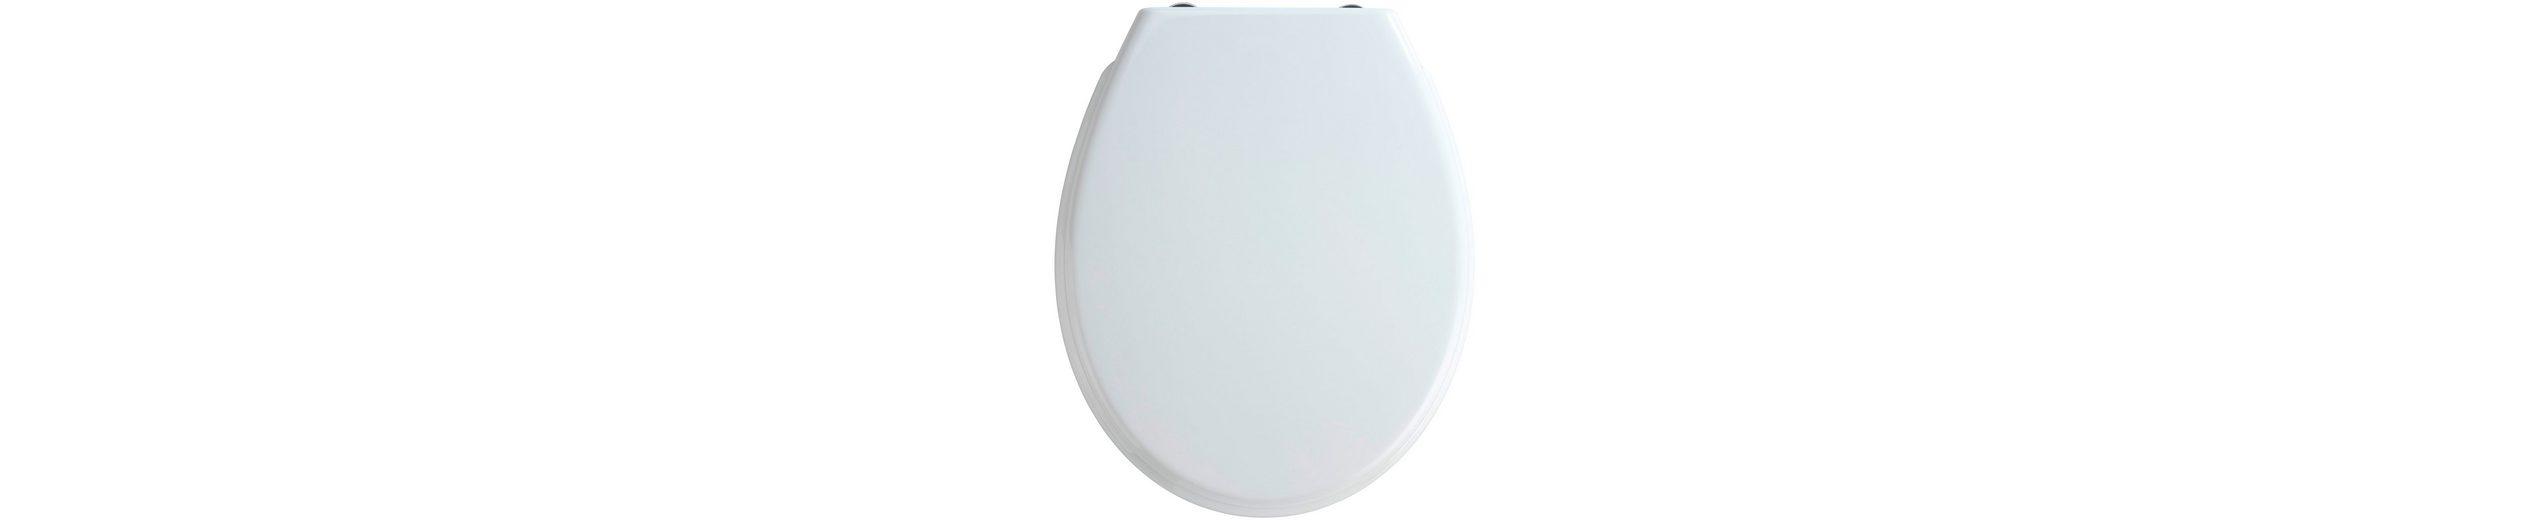 WC-Sitz »Bilbao«, Mit Absenkautomatik